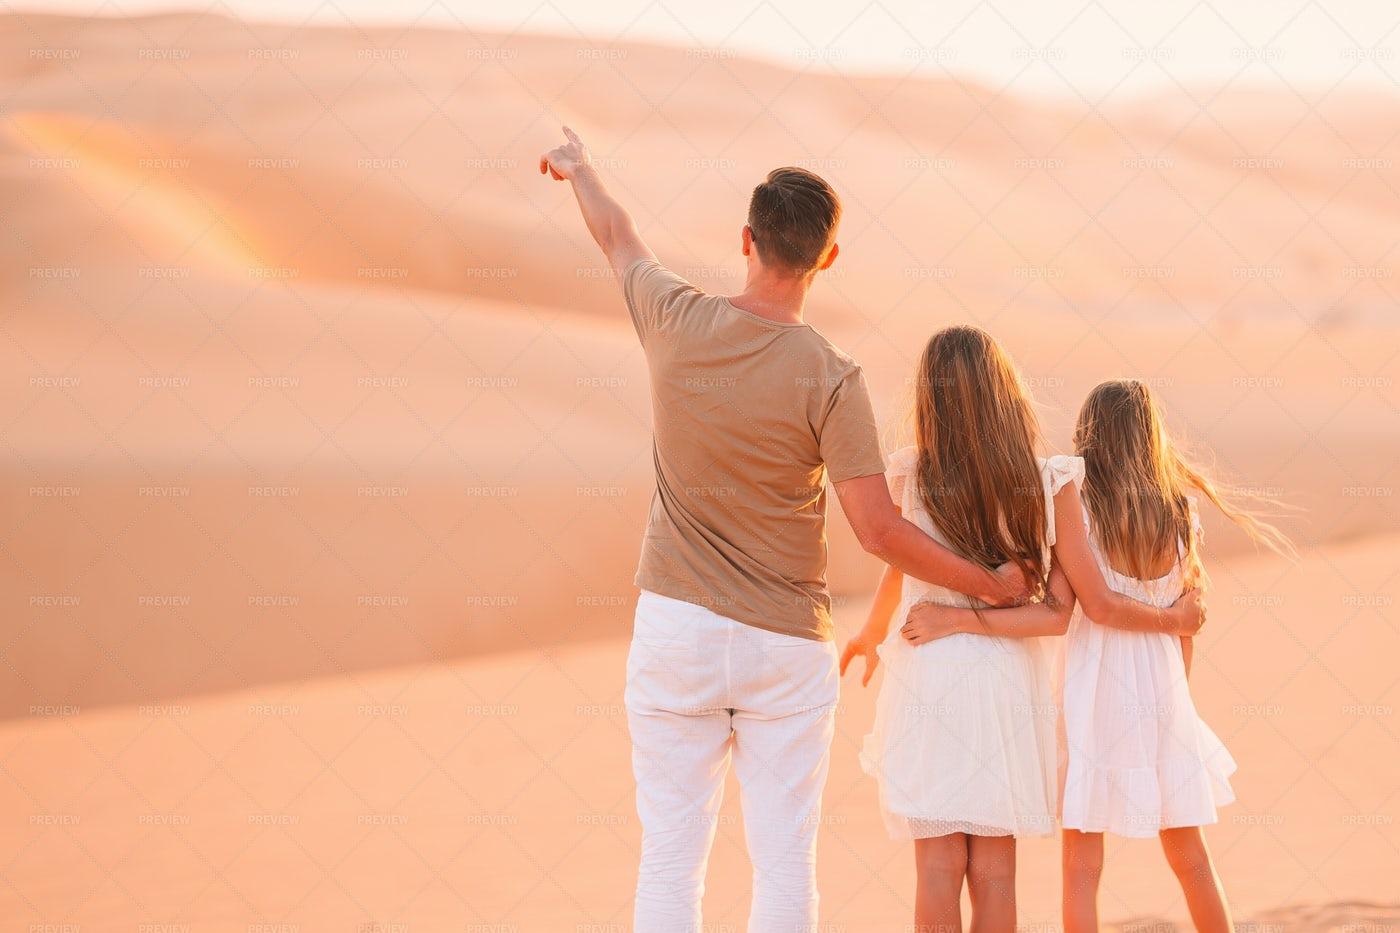 People In The Desert: Stock Photos